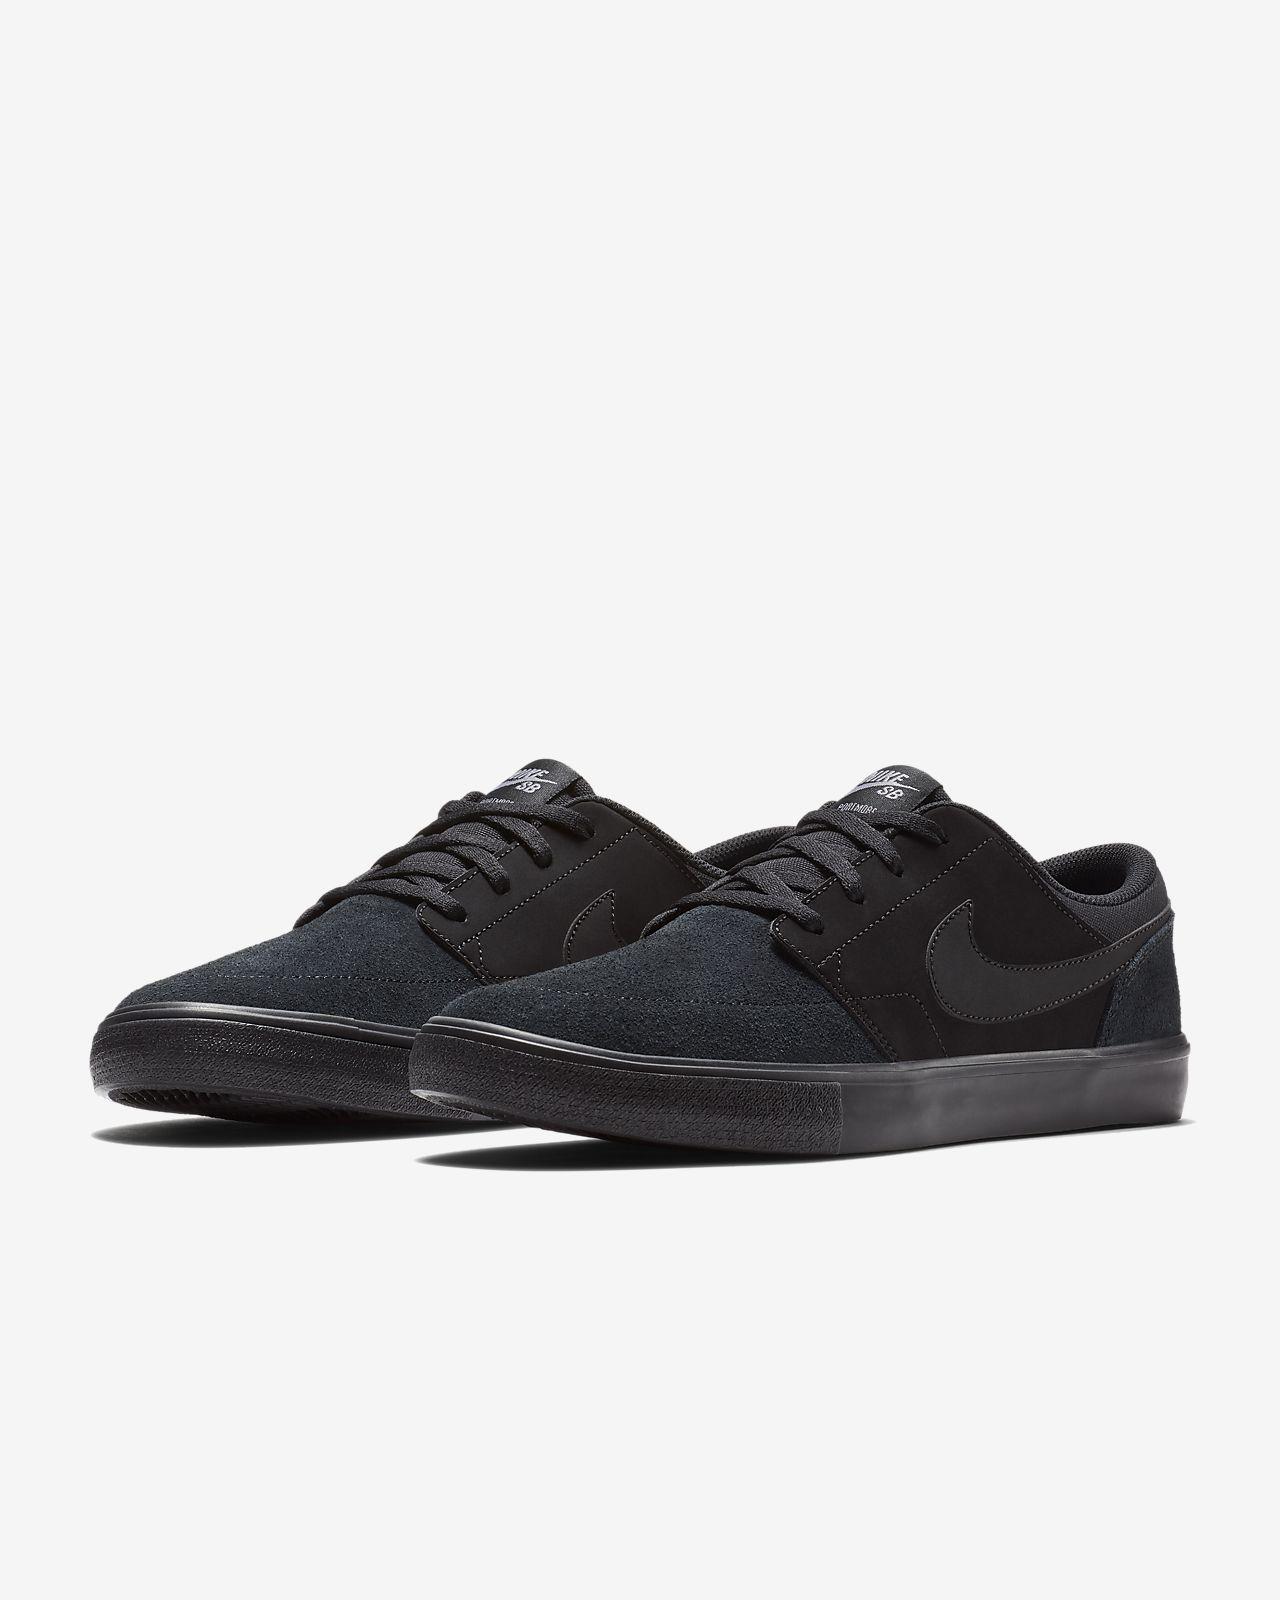 Nike sb portmore ii solar uomo 880266 005 nero